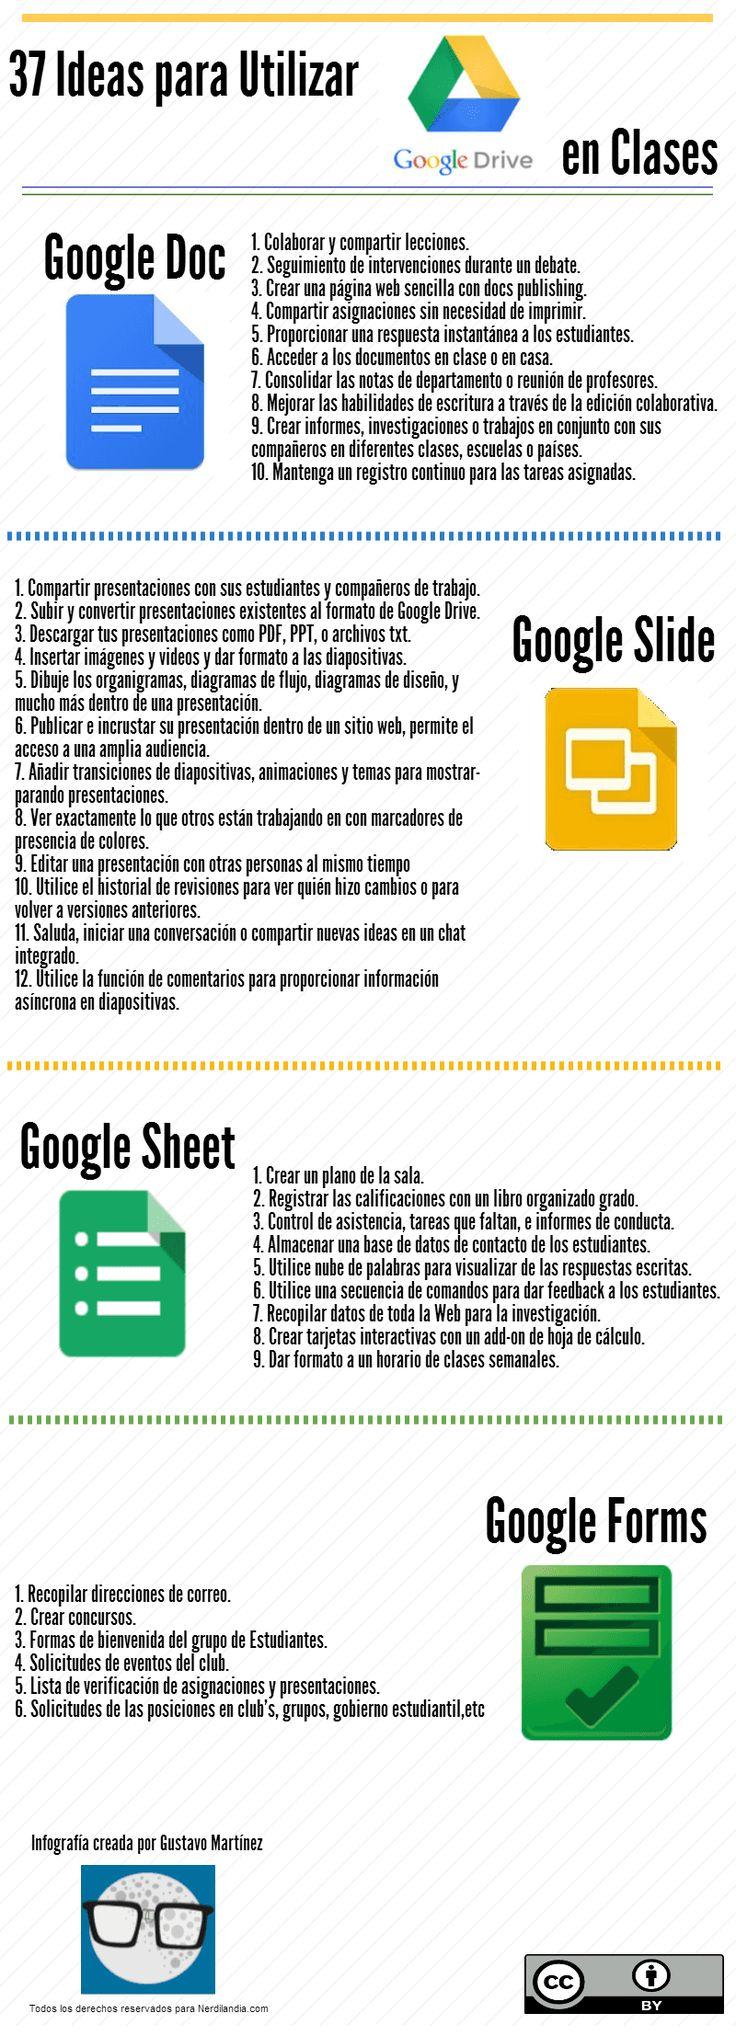 Google-Drive37IdeasAula-Infografía-BlogGesvin